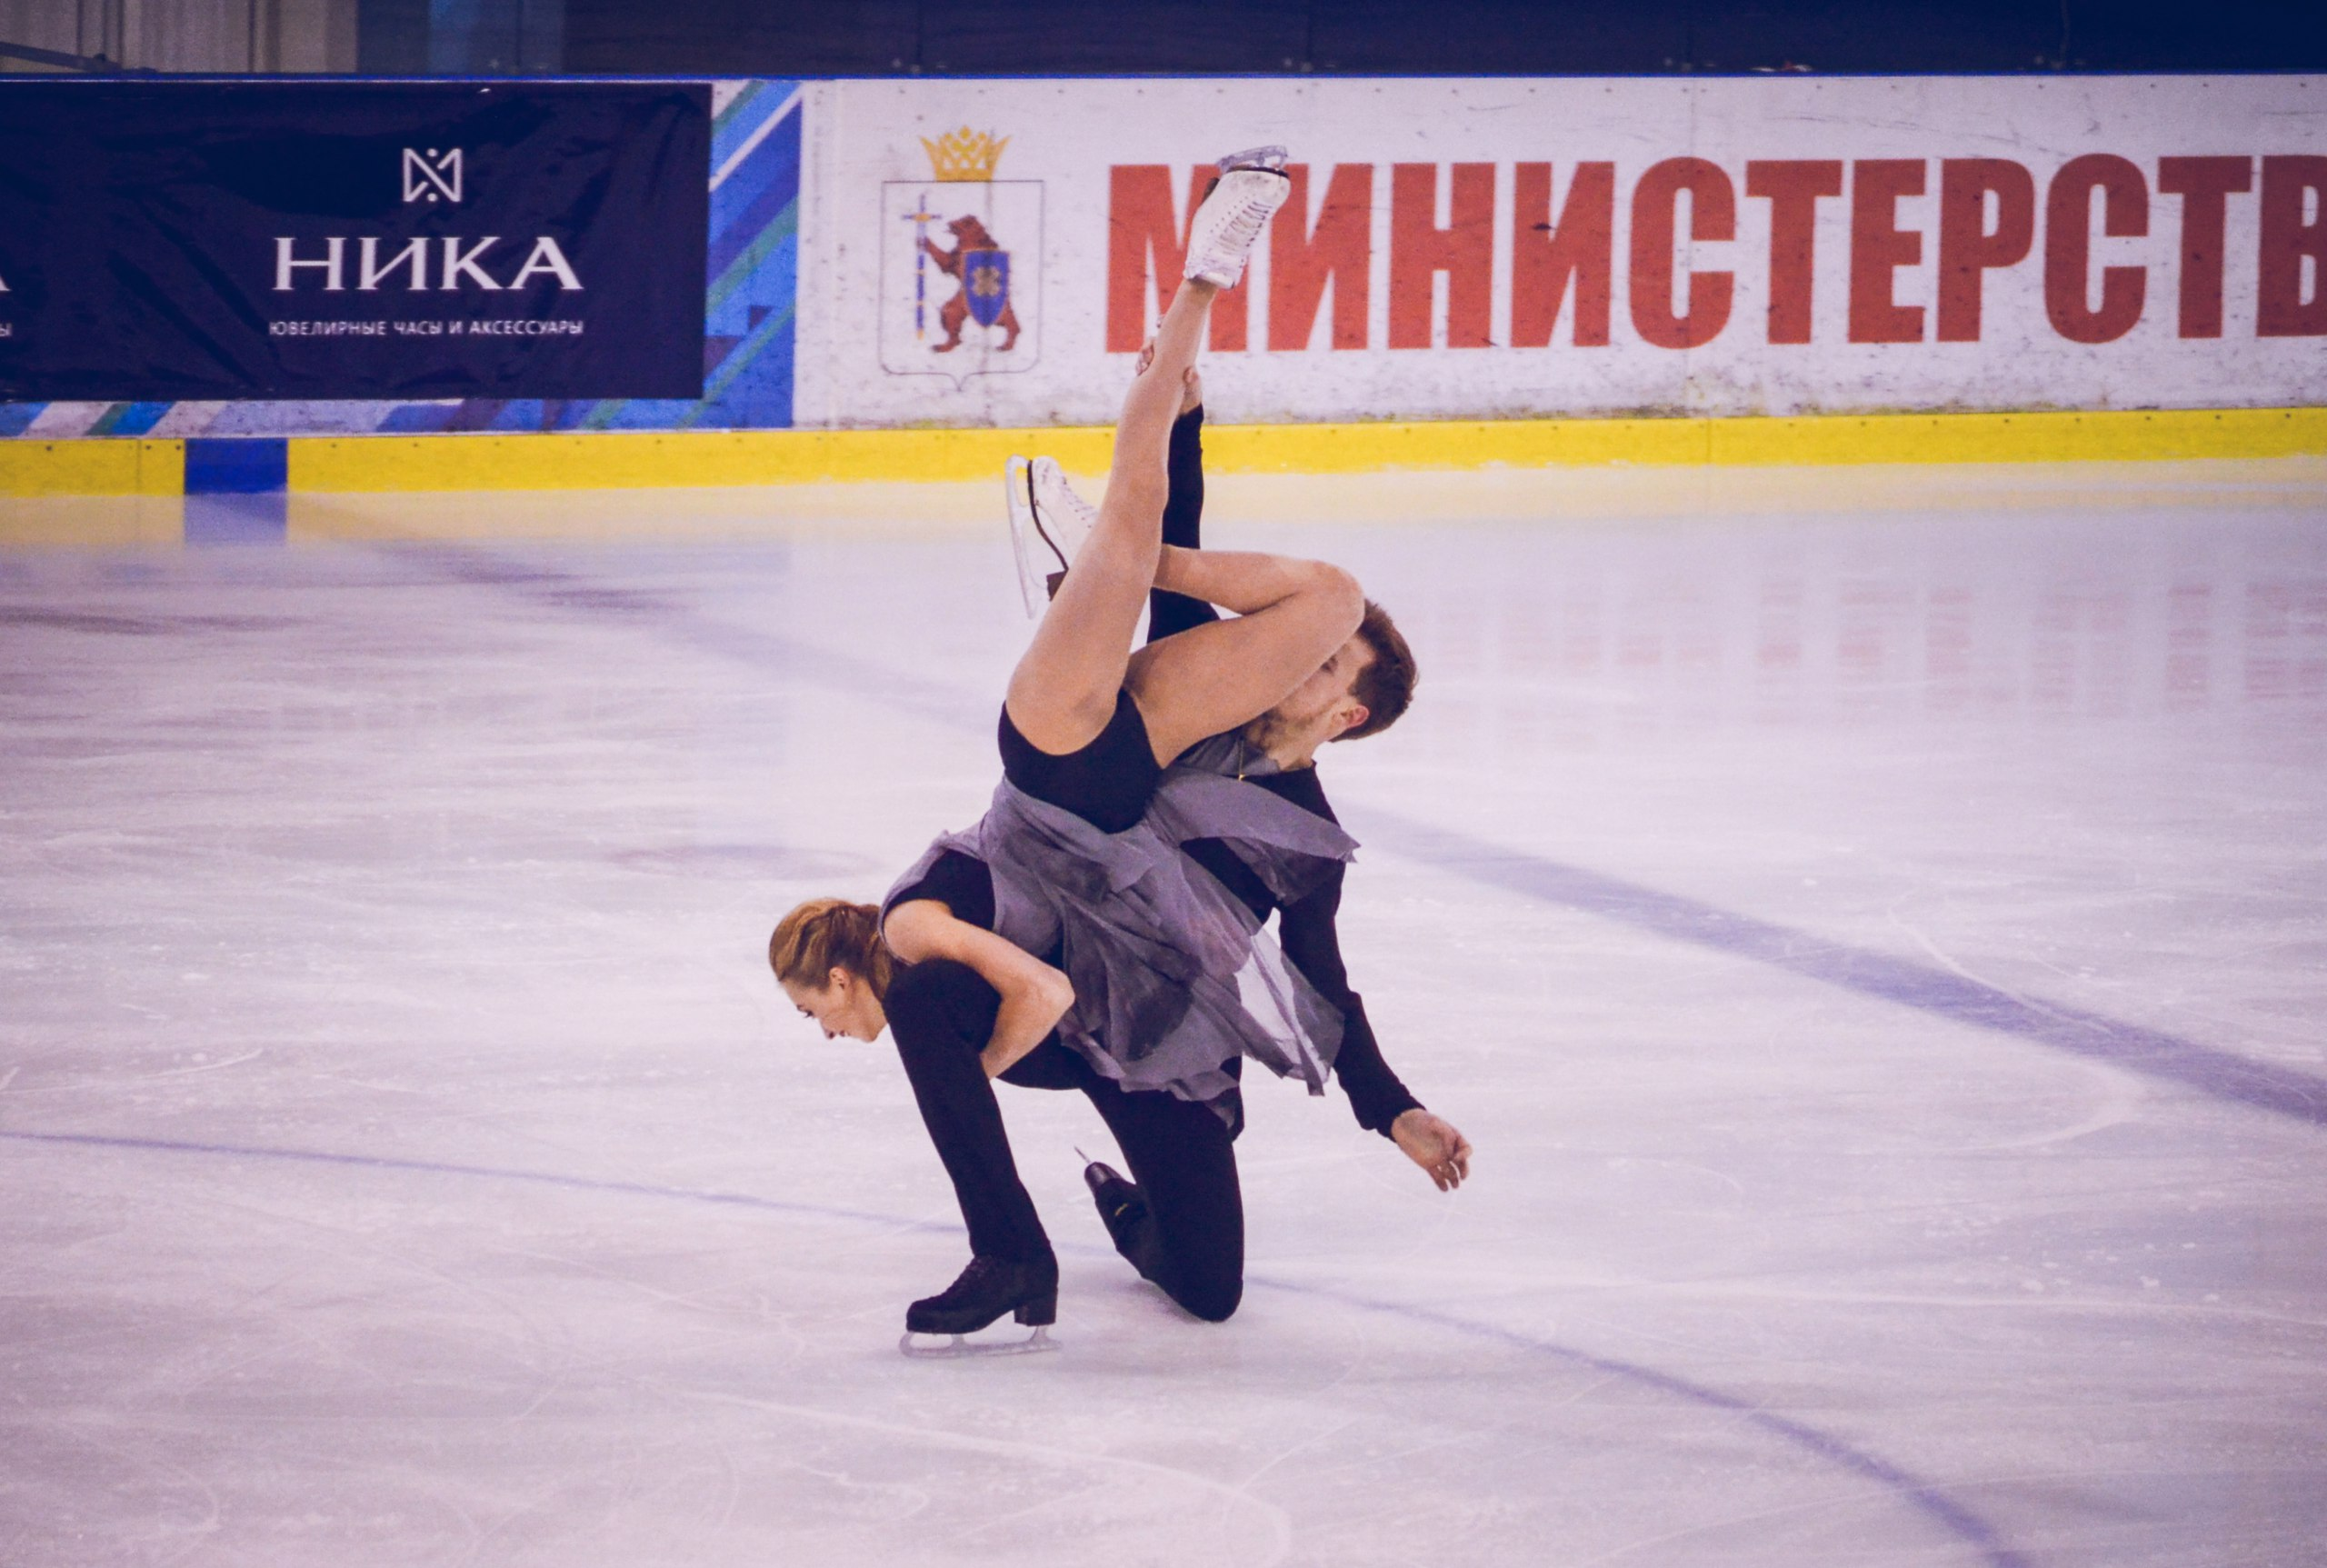 Виктория Синицина - Никита Кацалапов - 7 - Страница 3 WAMXLV0xHSM